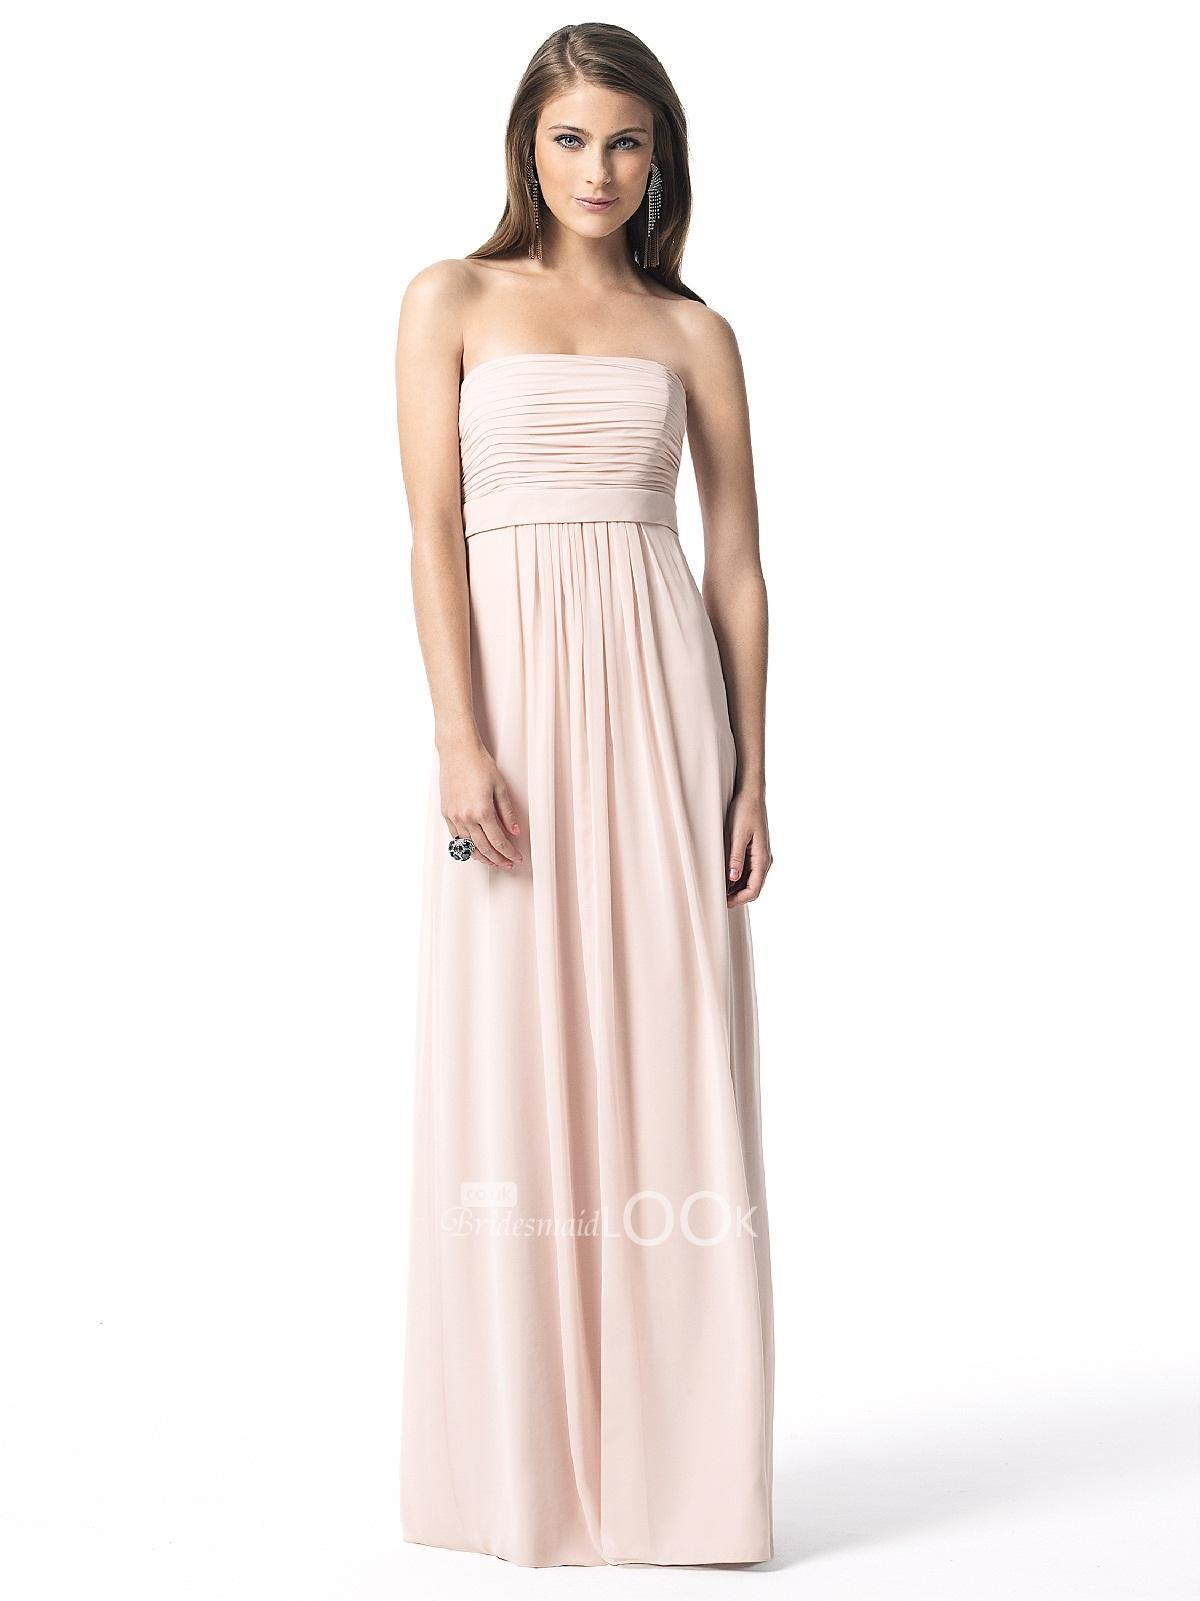 Cameo chiffon strapless floor length ruched empire waist bridesmaid